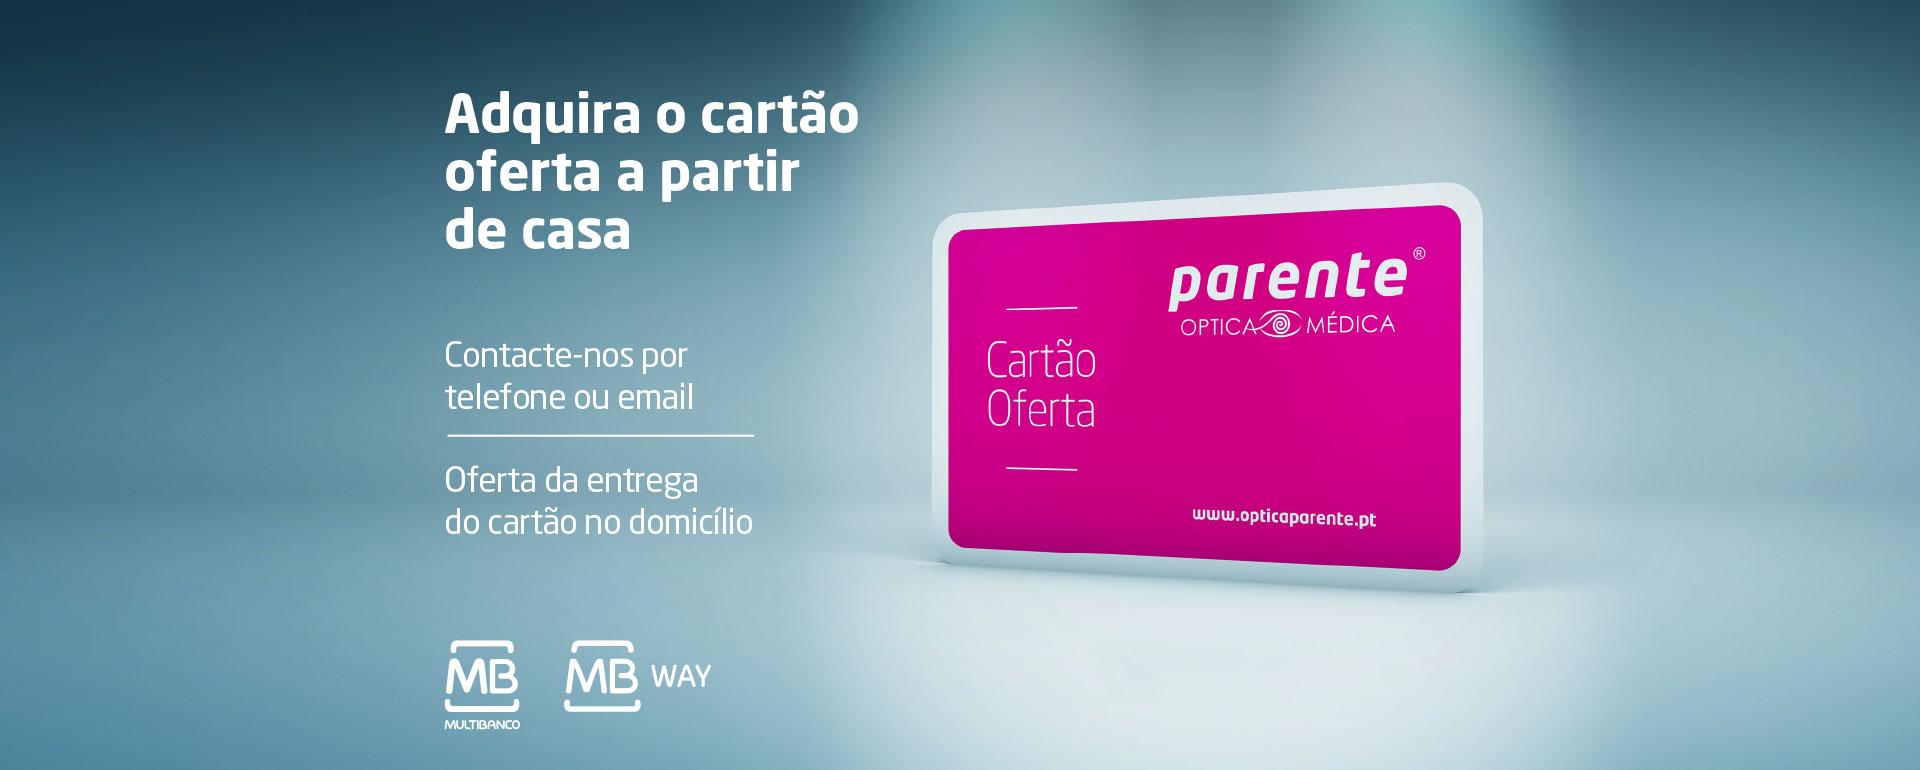 POM_CARTAO OFERTA_2021_site_1920x770